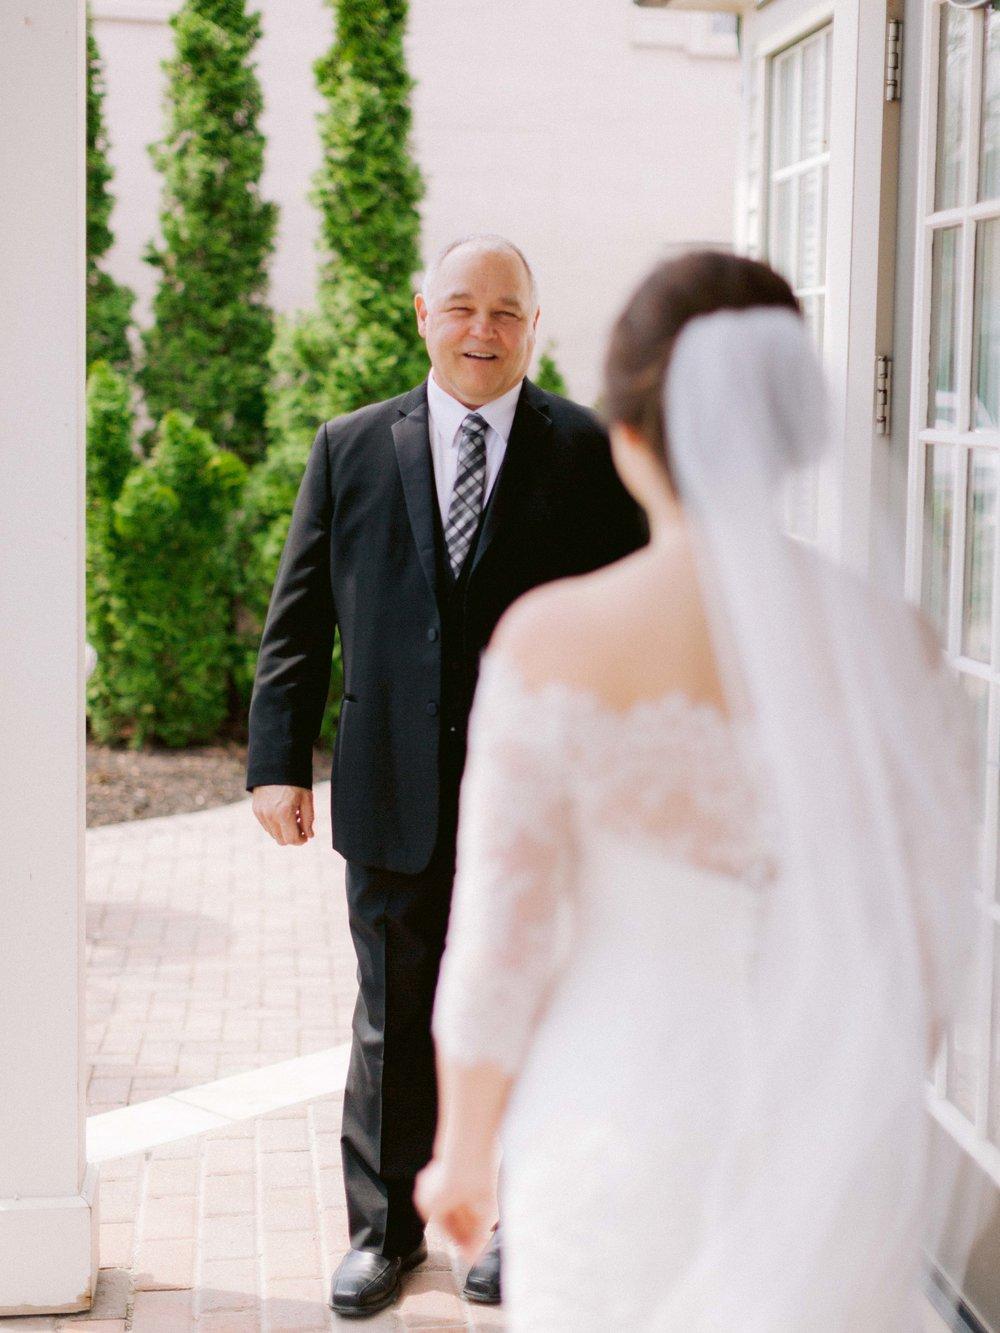 Niagara_on_the_lake_spring_wedding_kurtz_orpia_toronto_Vineyard_wedding_fine_art (15 of 92).jpg